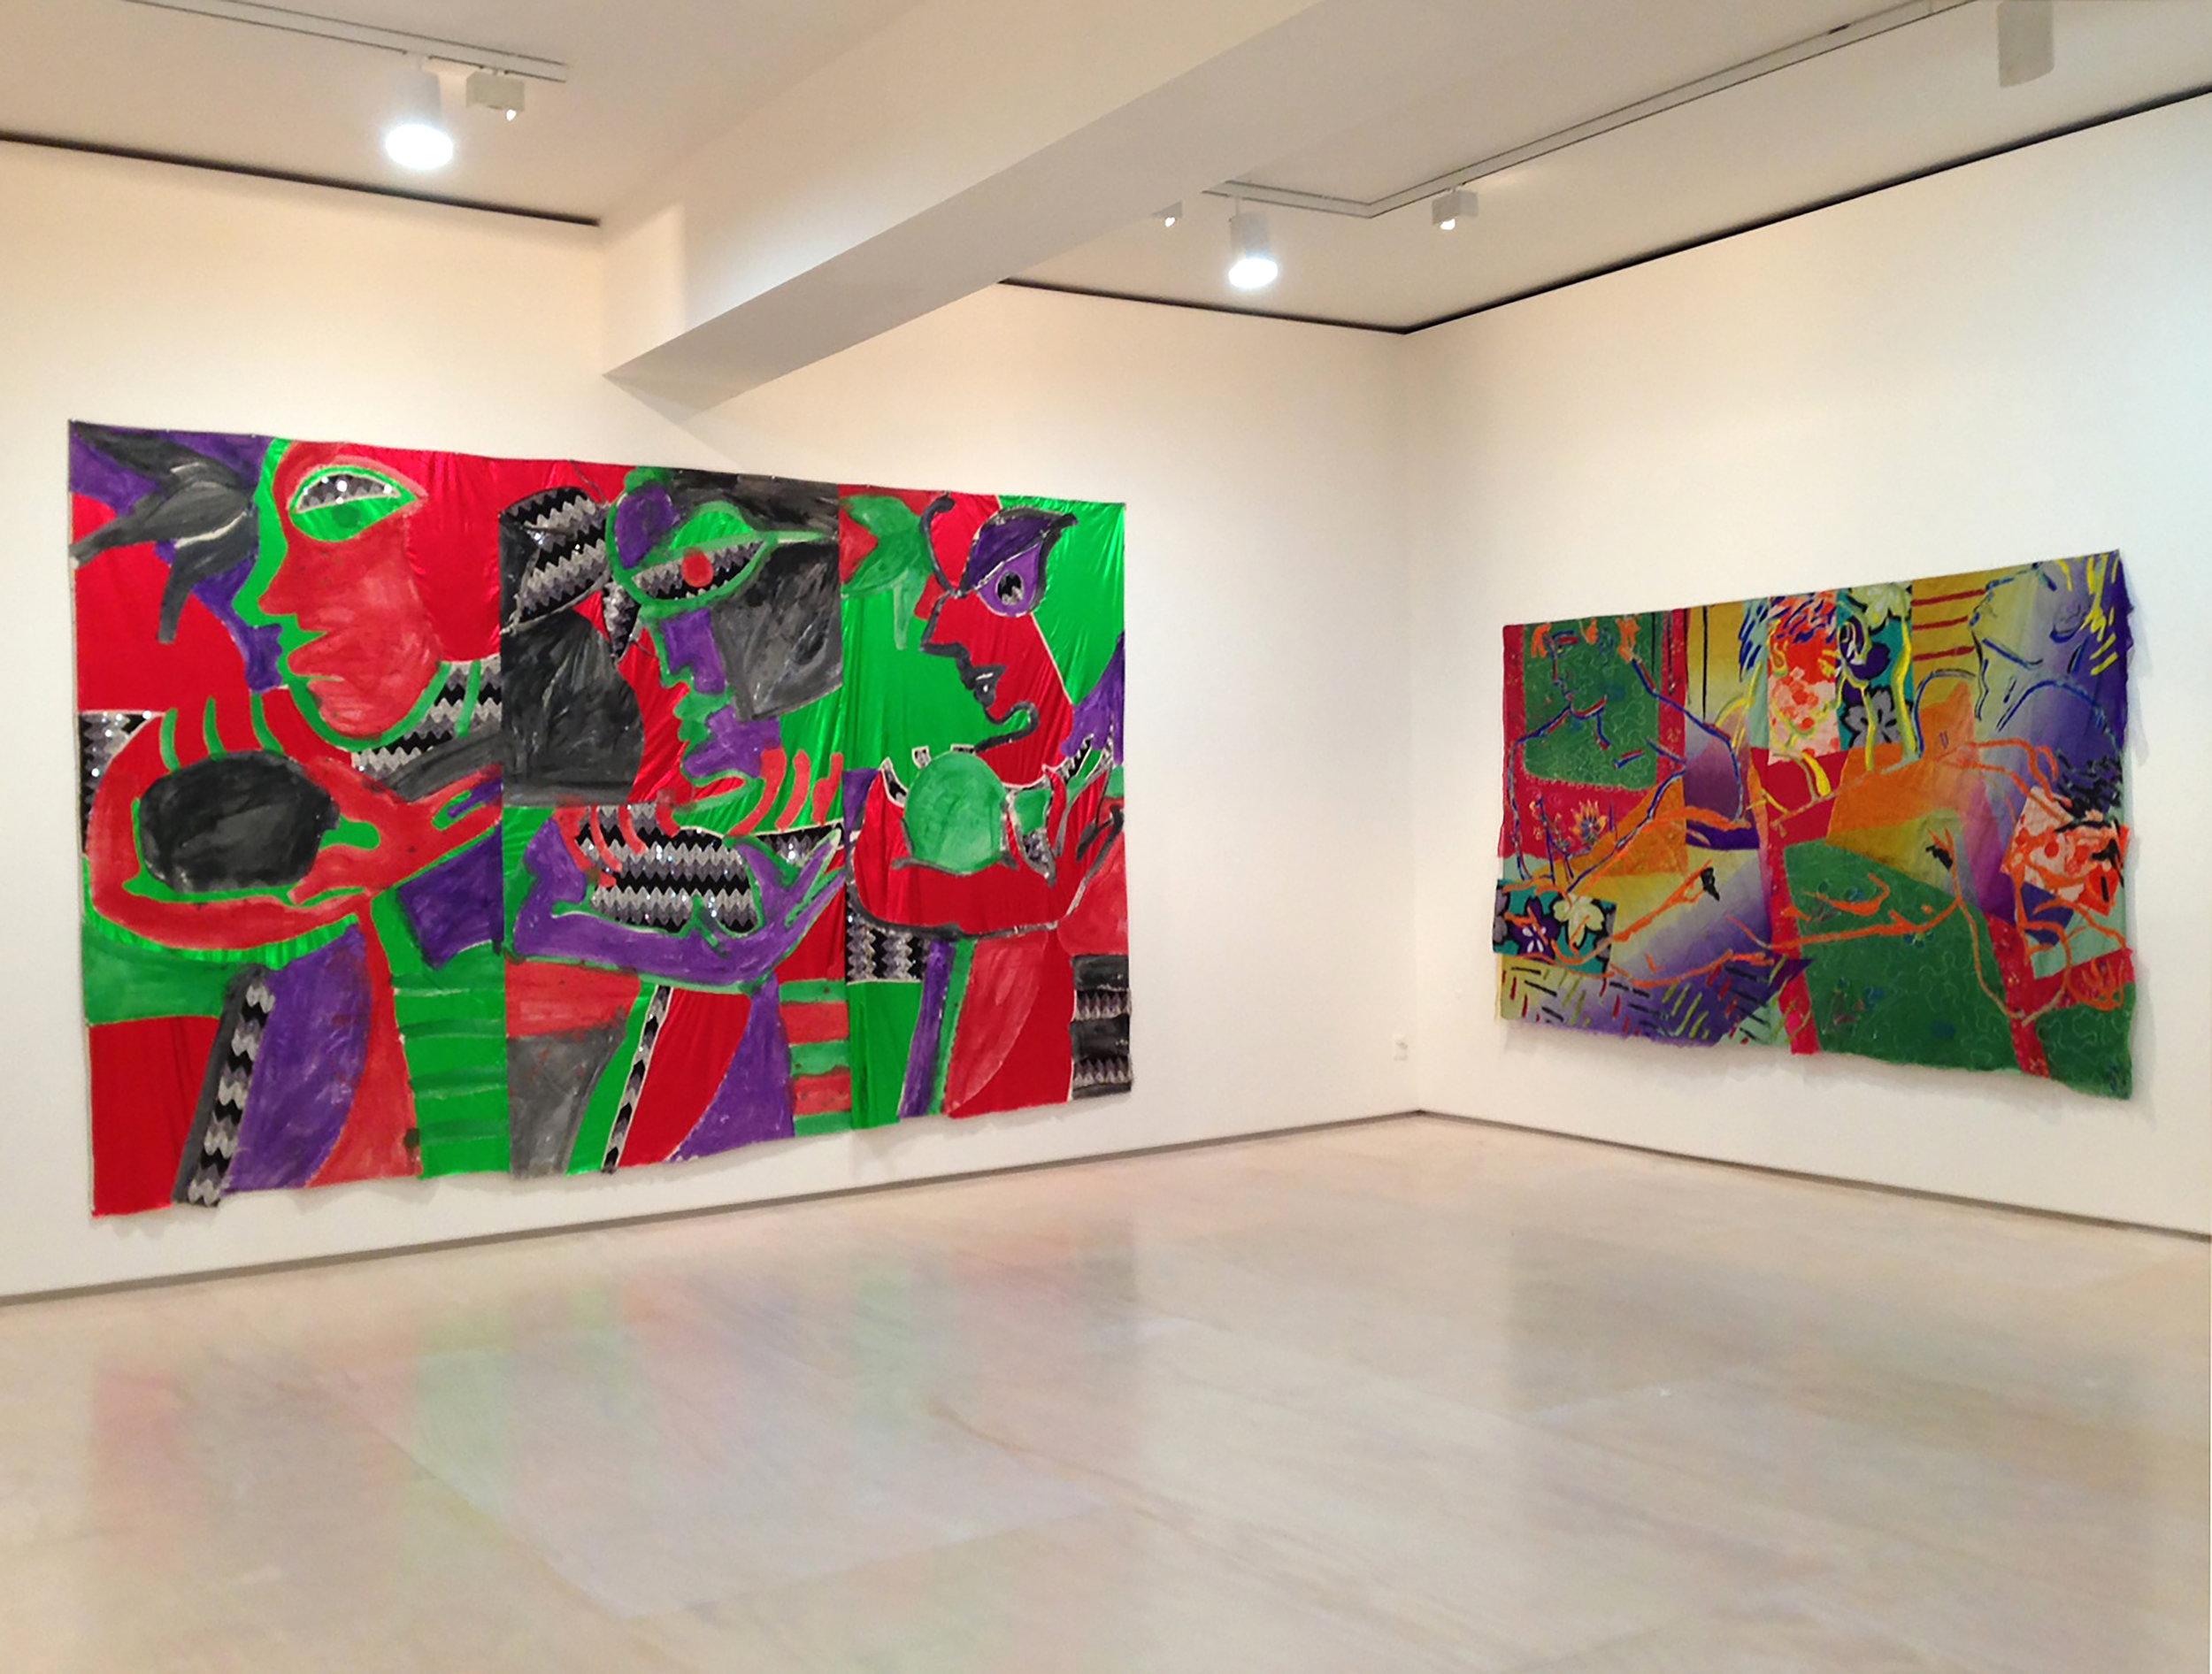 Installation view: (left) Robert Kushner,  Samba Class , 1982, acrylic on cotton with sequin and mylar reverse appliqué; (right) Robert Kushner,  Torrid Dreams , 1984, acrylic, silk and cotton appliqué on cotton.